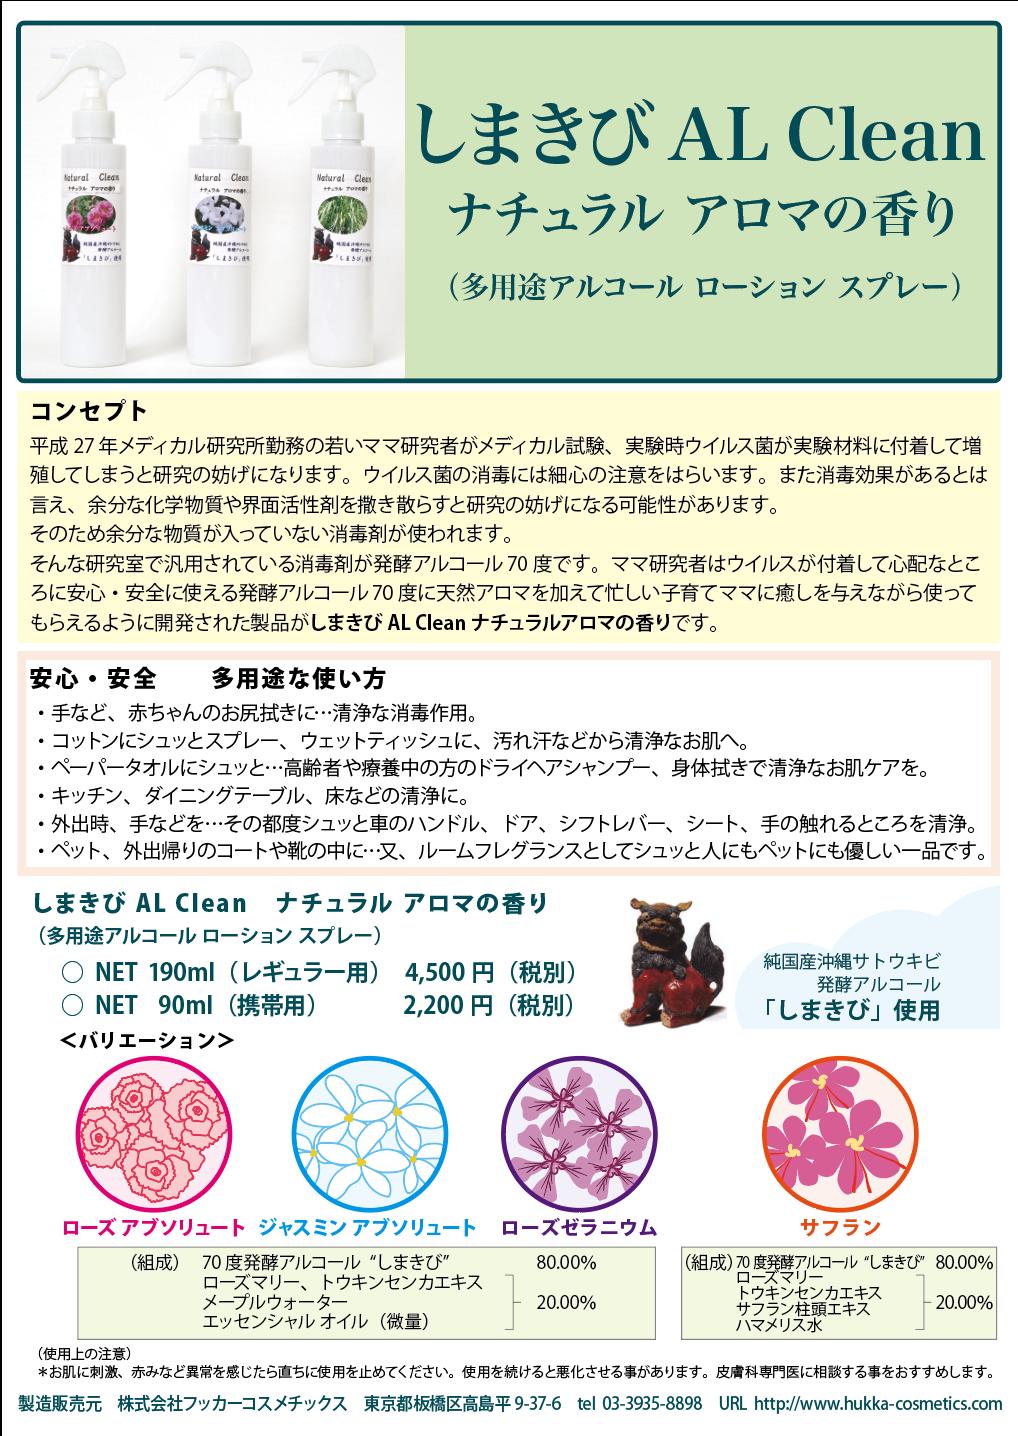 3!cid_88878CBE-739E-4897-9071-DAA207CAC4C9@yamanashi_ac.png しまきびAL Clean